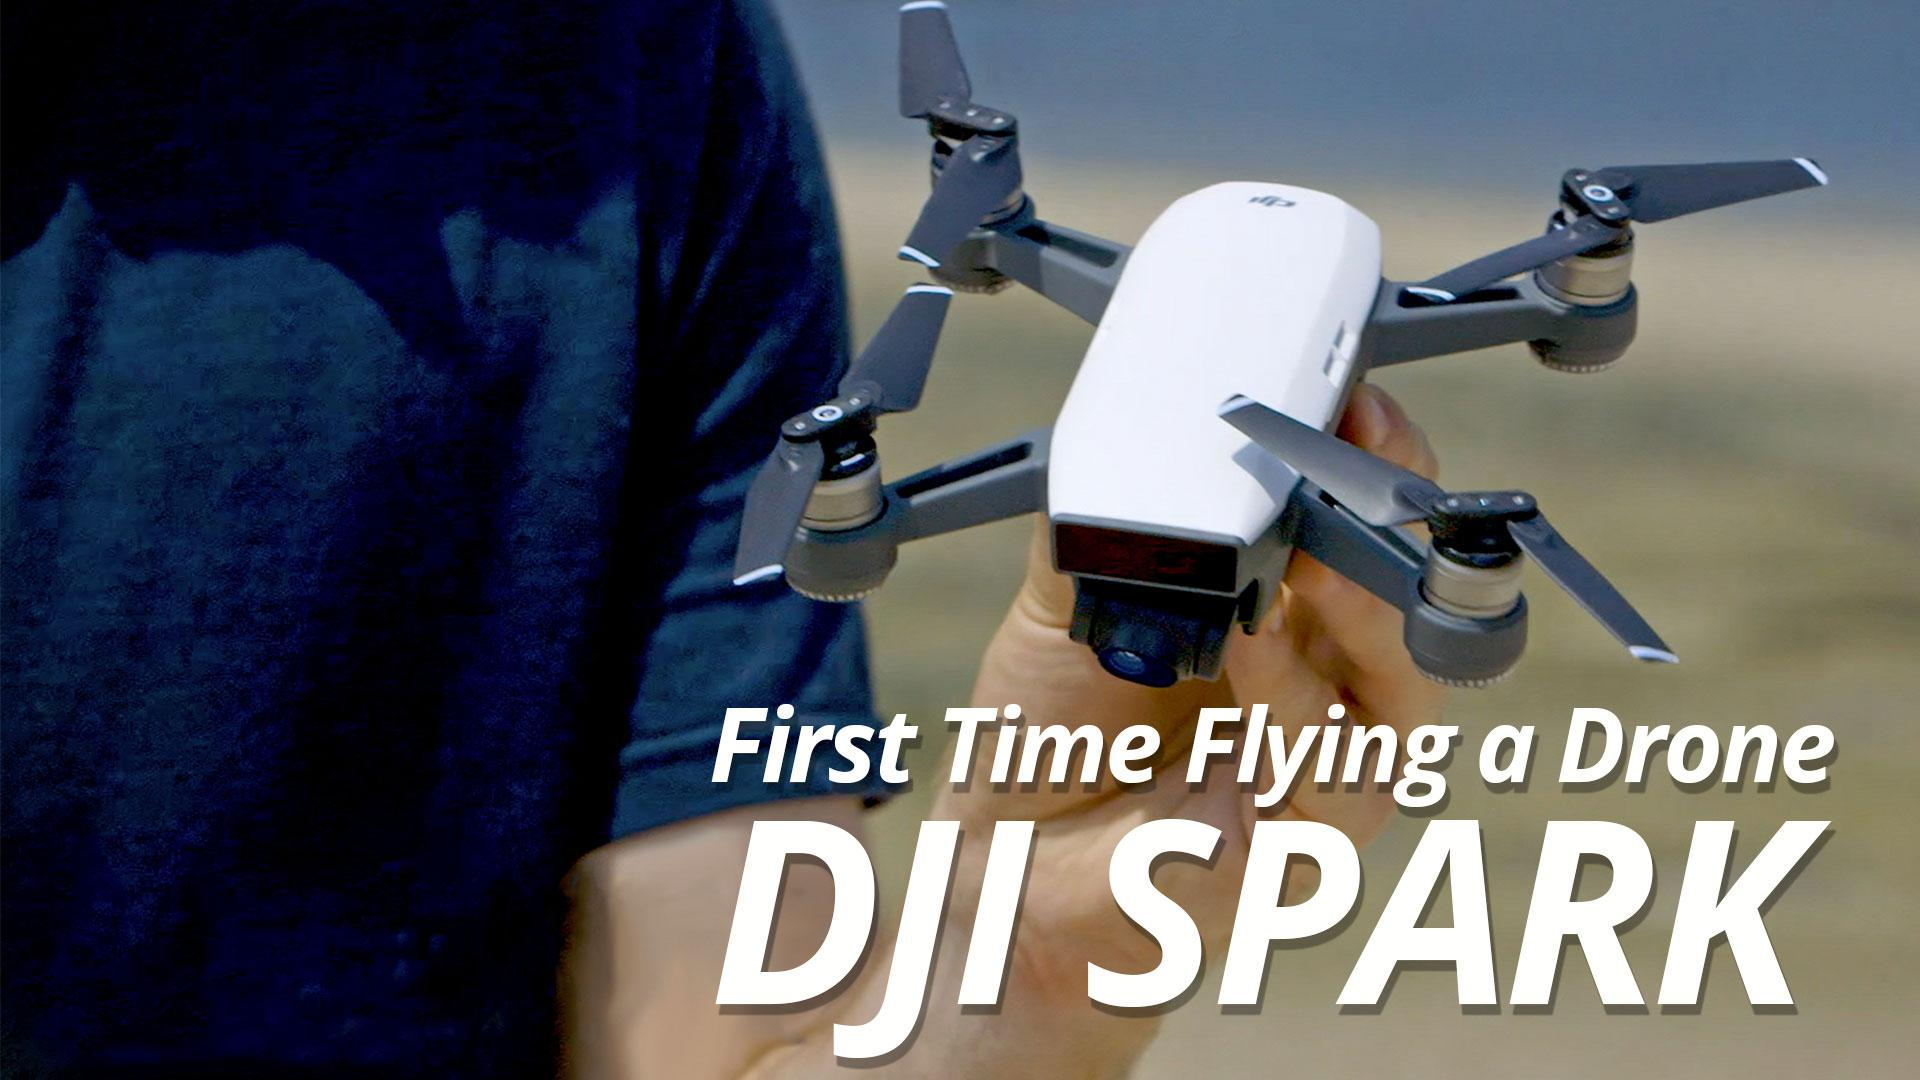 DJI Spark Quadcopter (Alpine White)